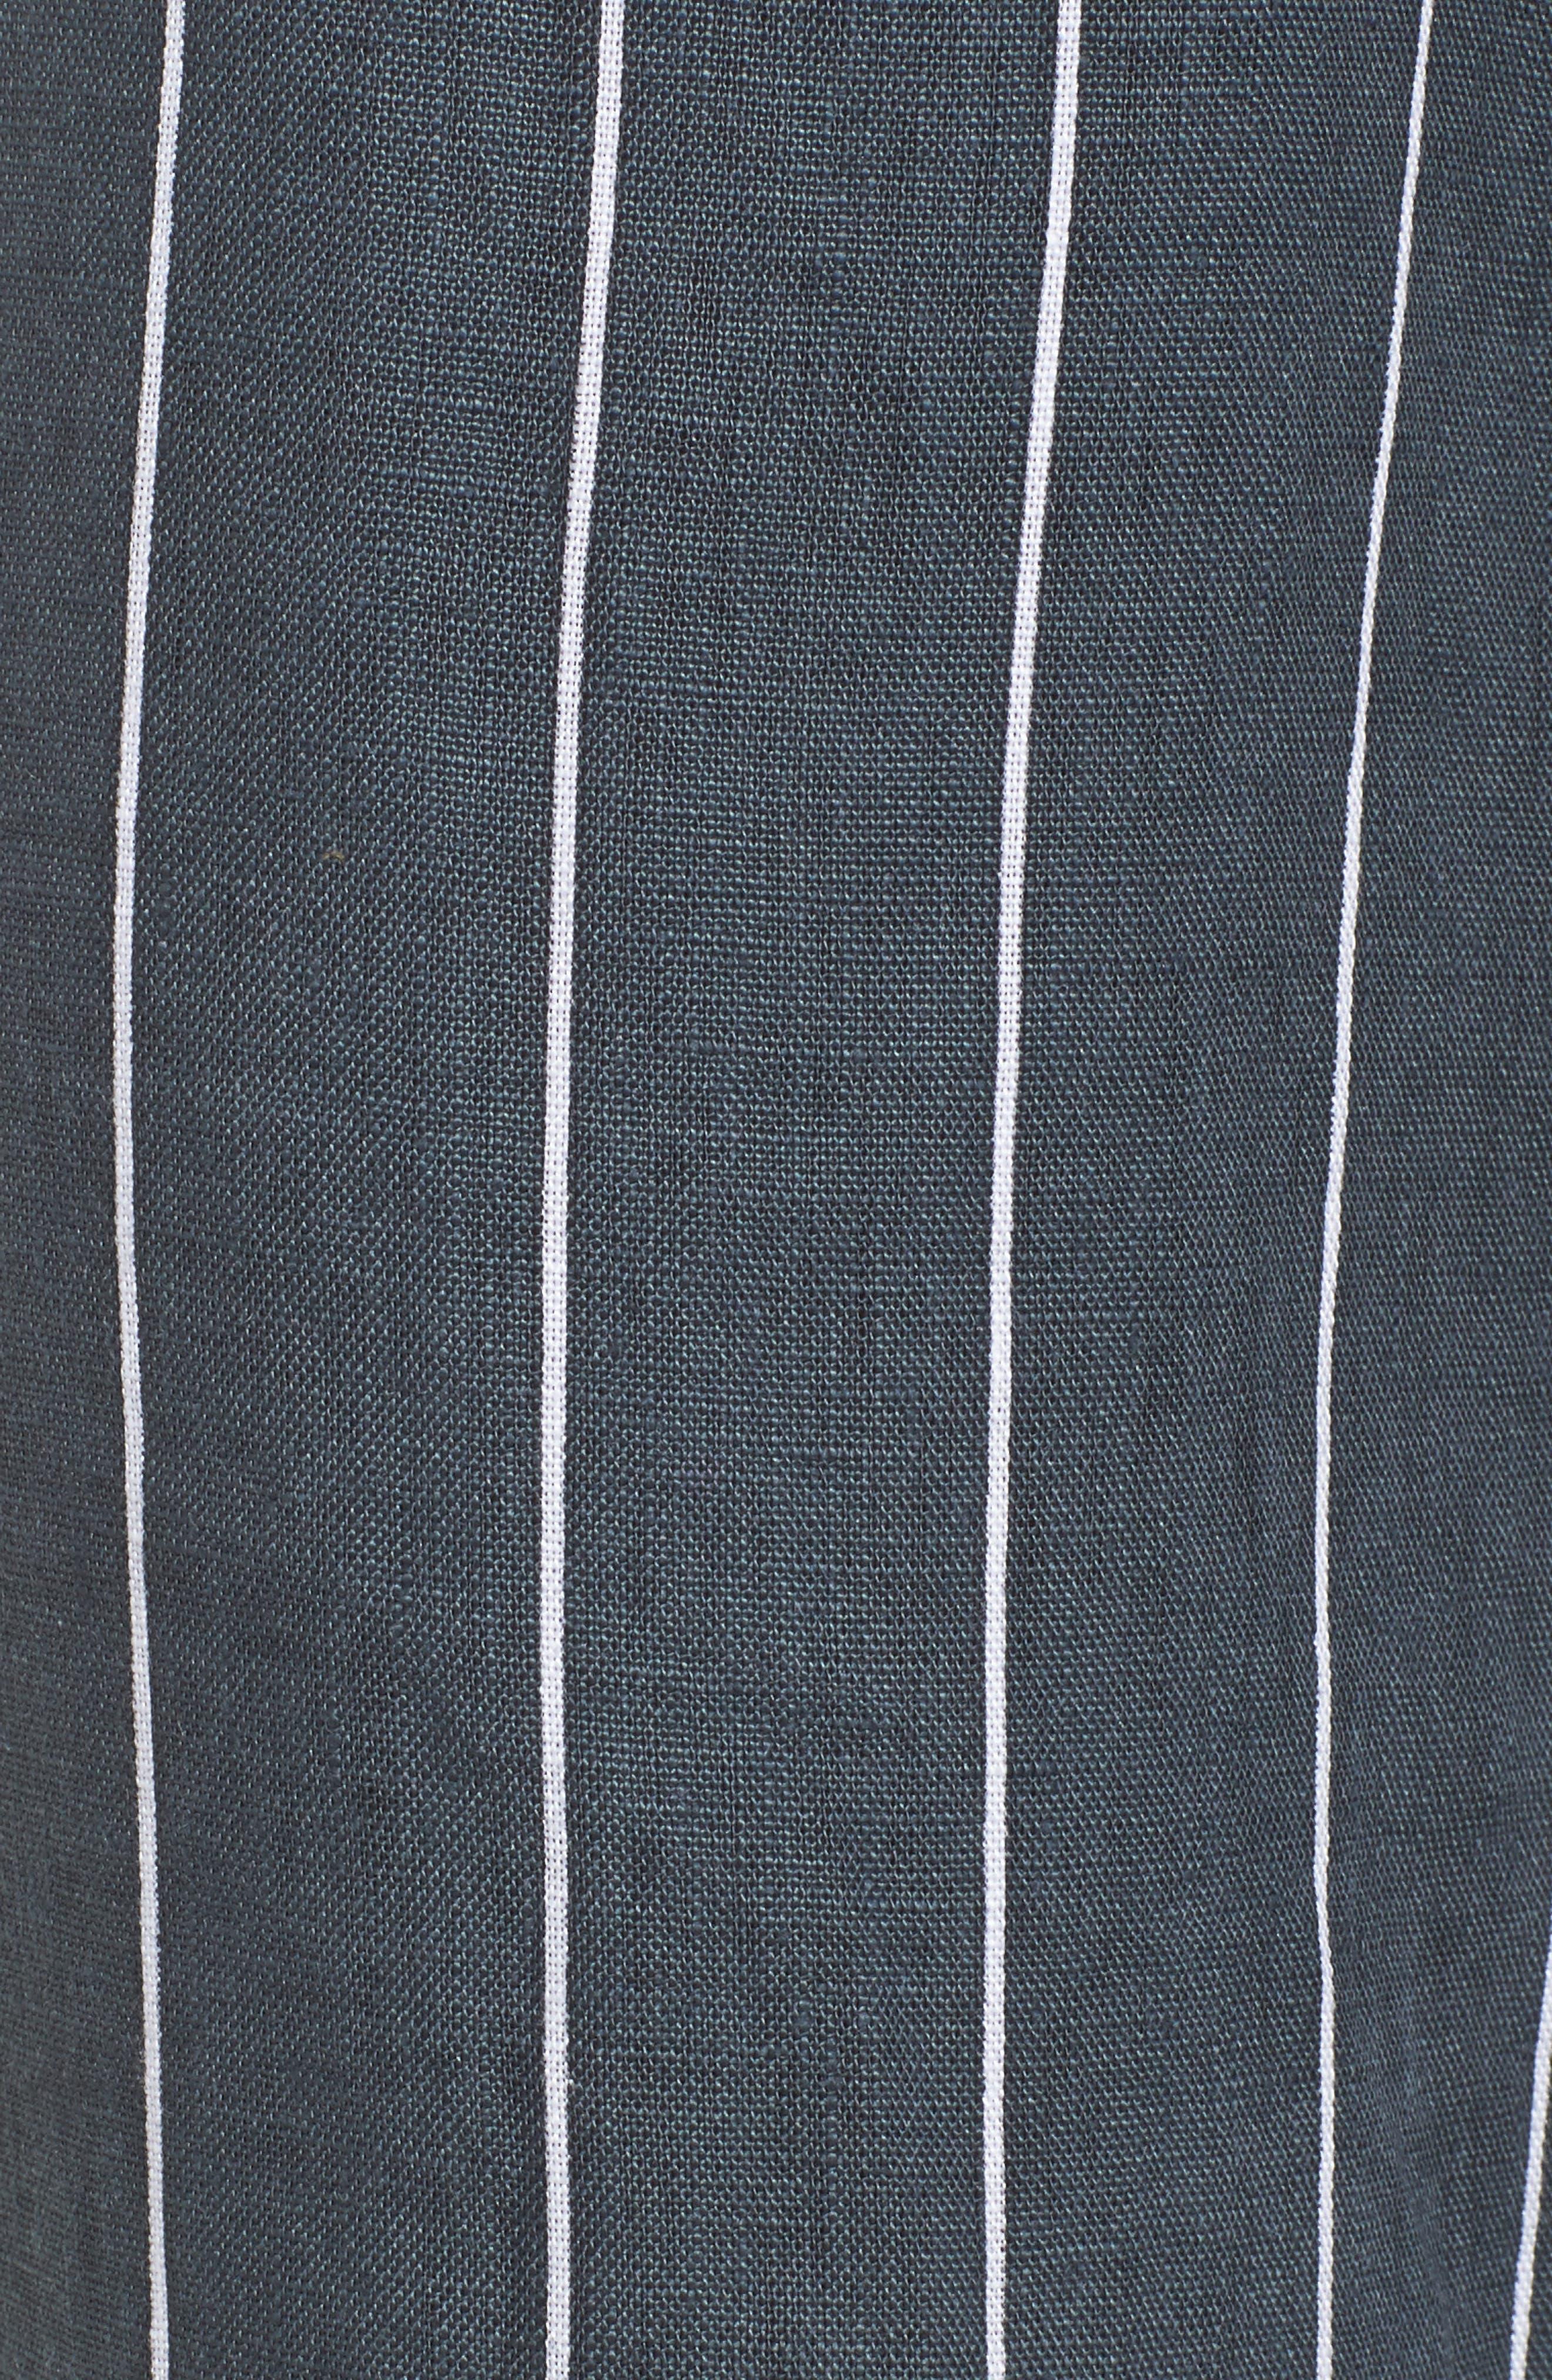 Como Pinstripe Wide Leg Crop Linen Pants,                             Alternate thumbnail 5, color,                             CHARCOAL